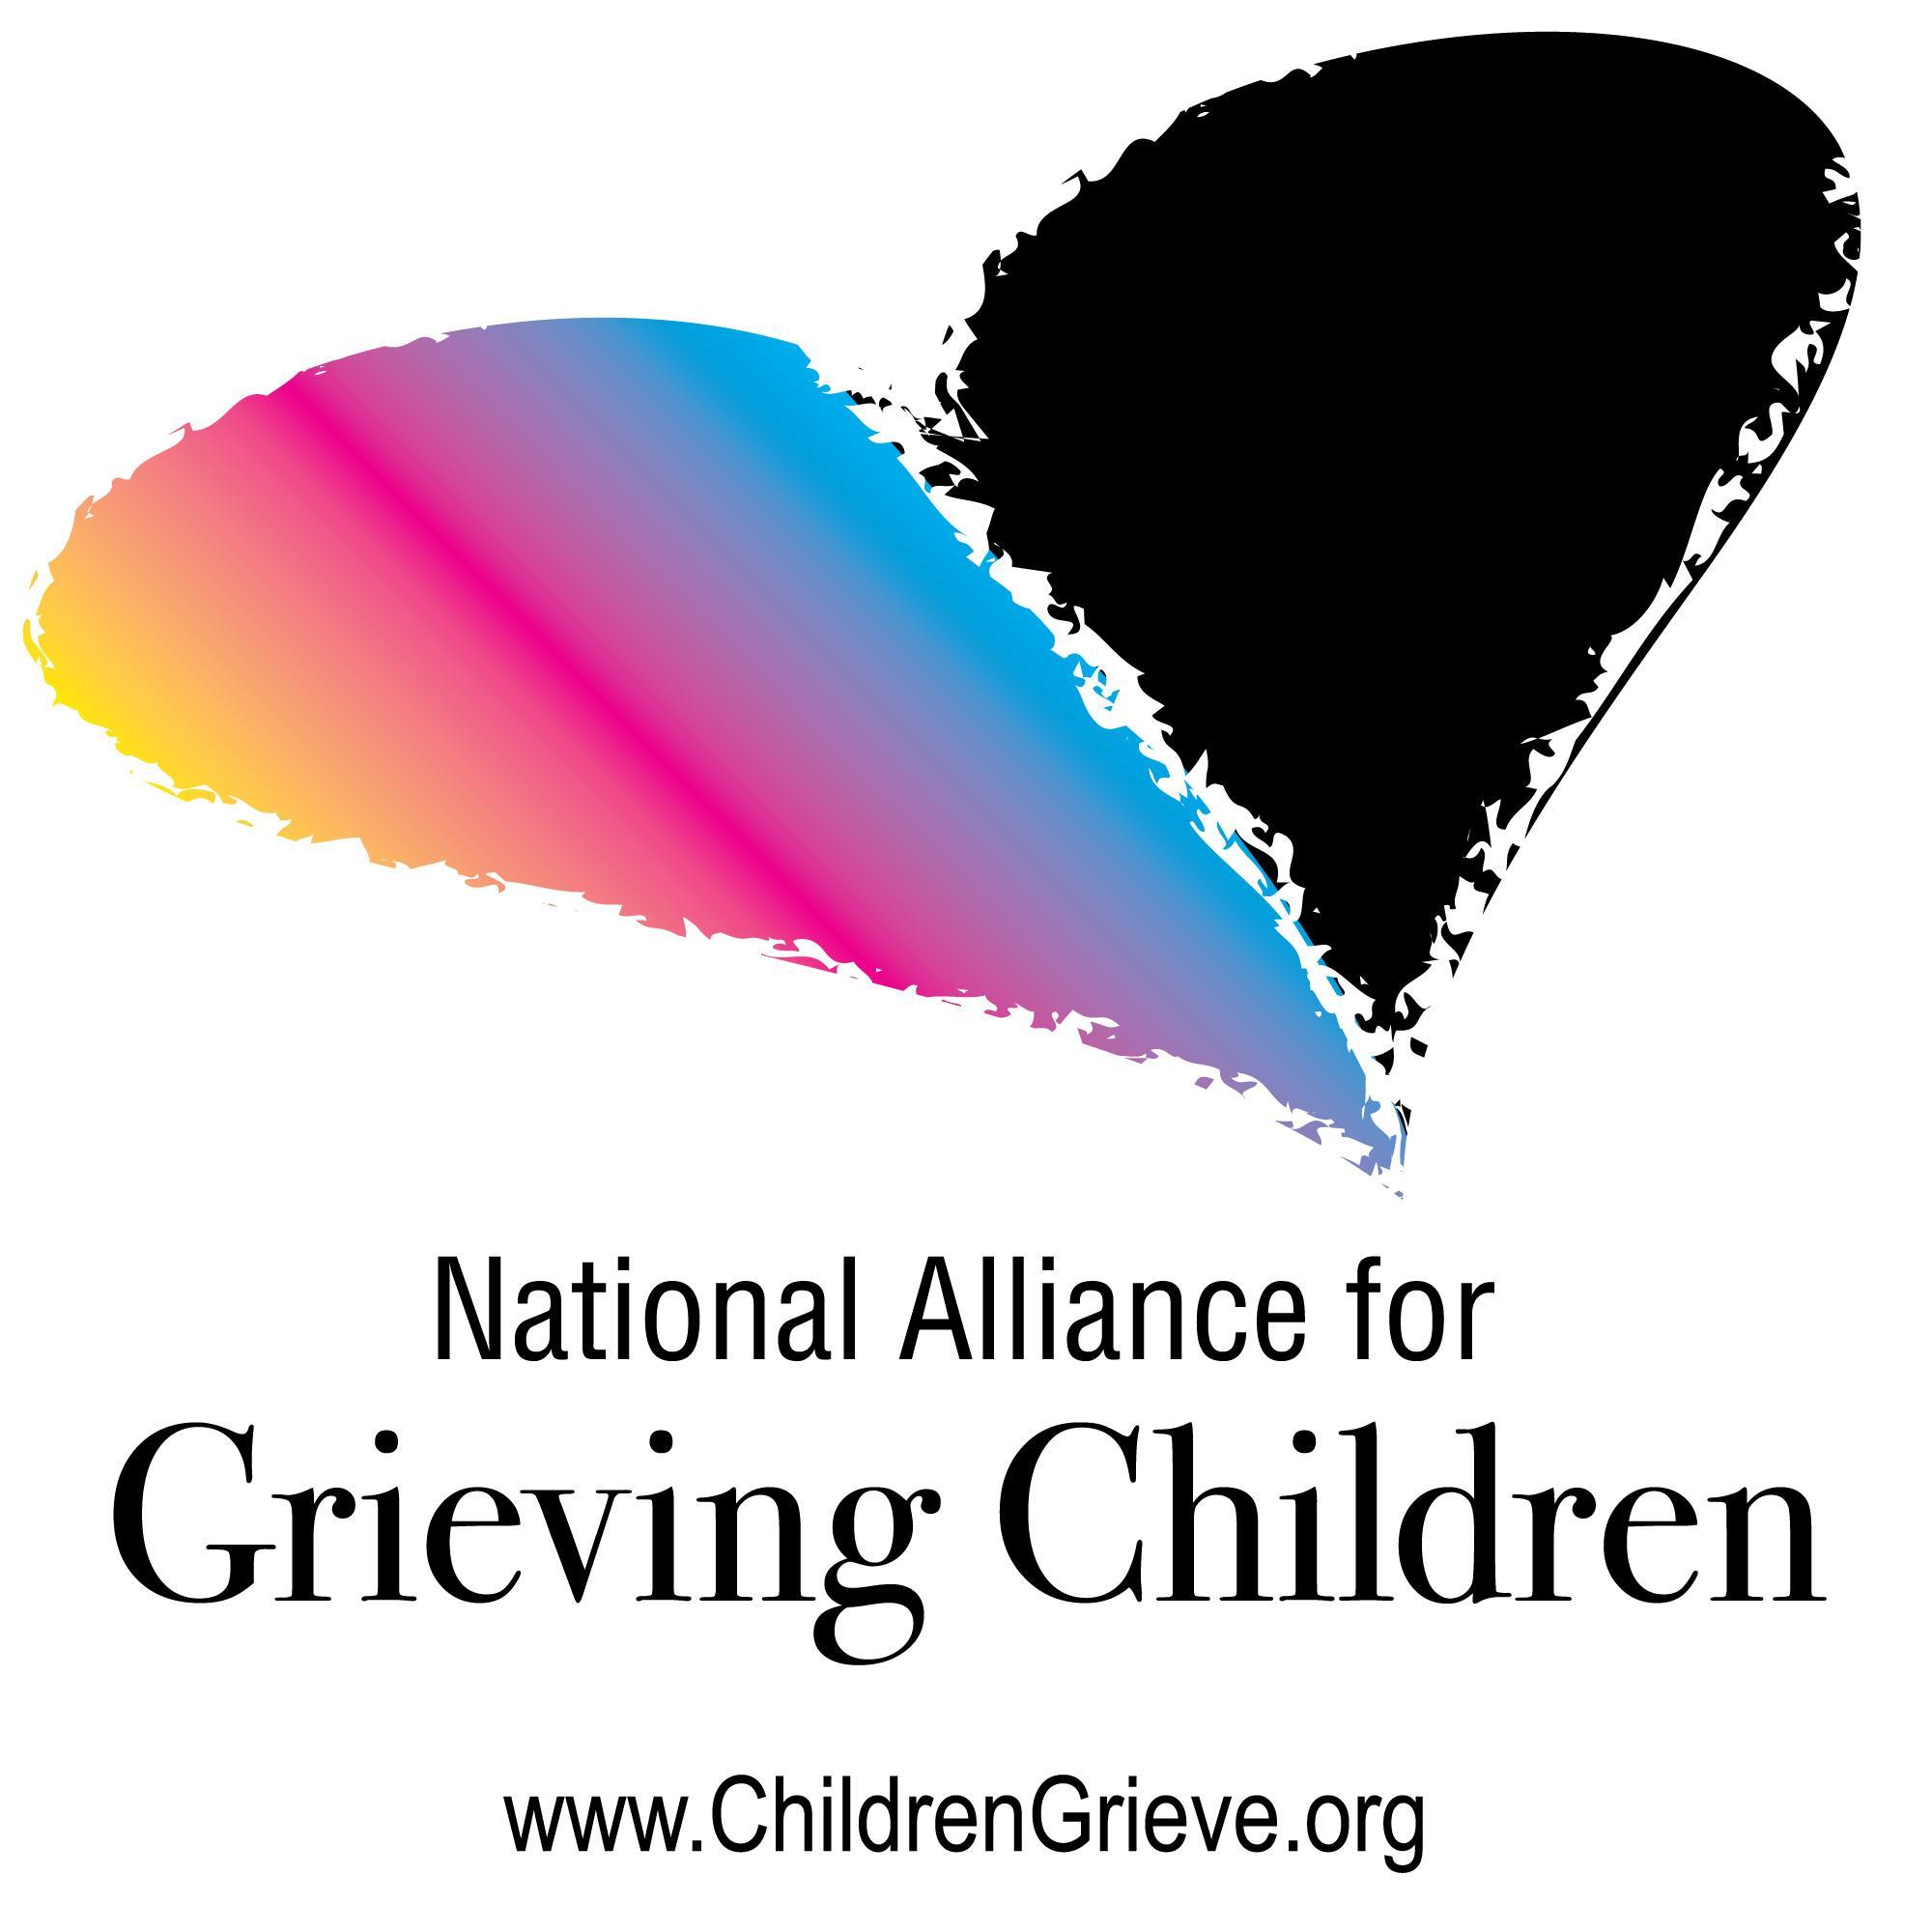 childrengrieve.org